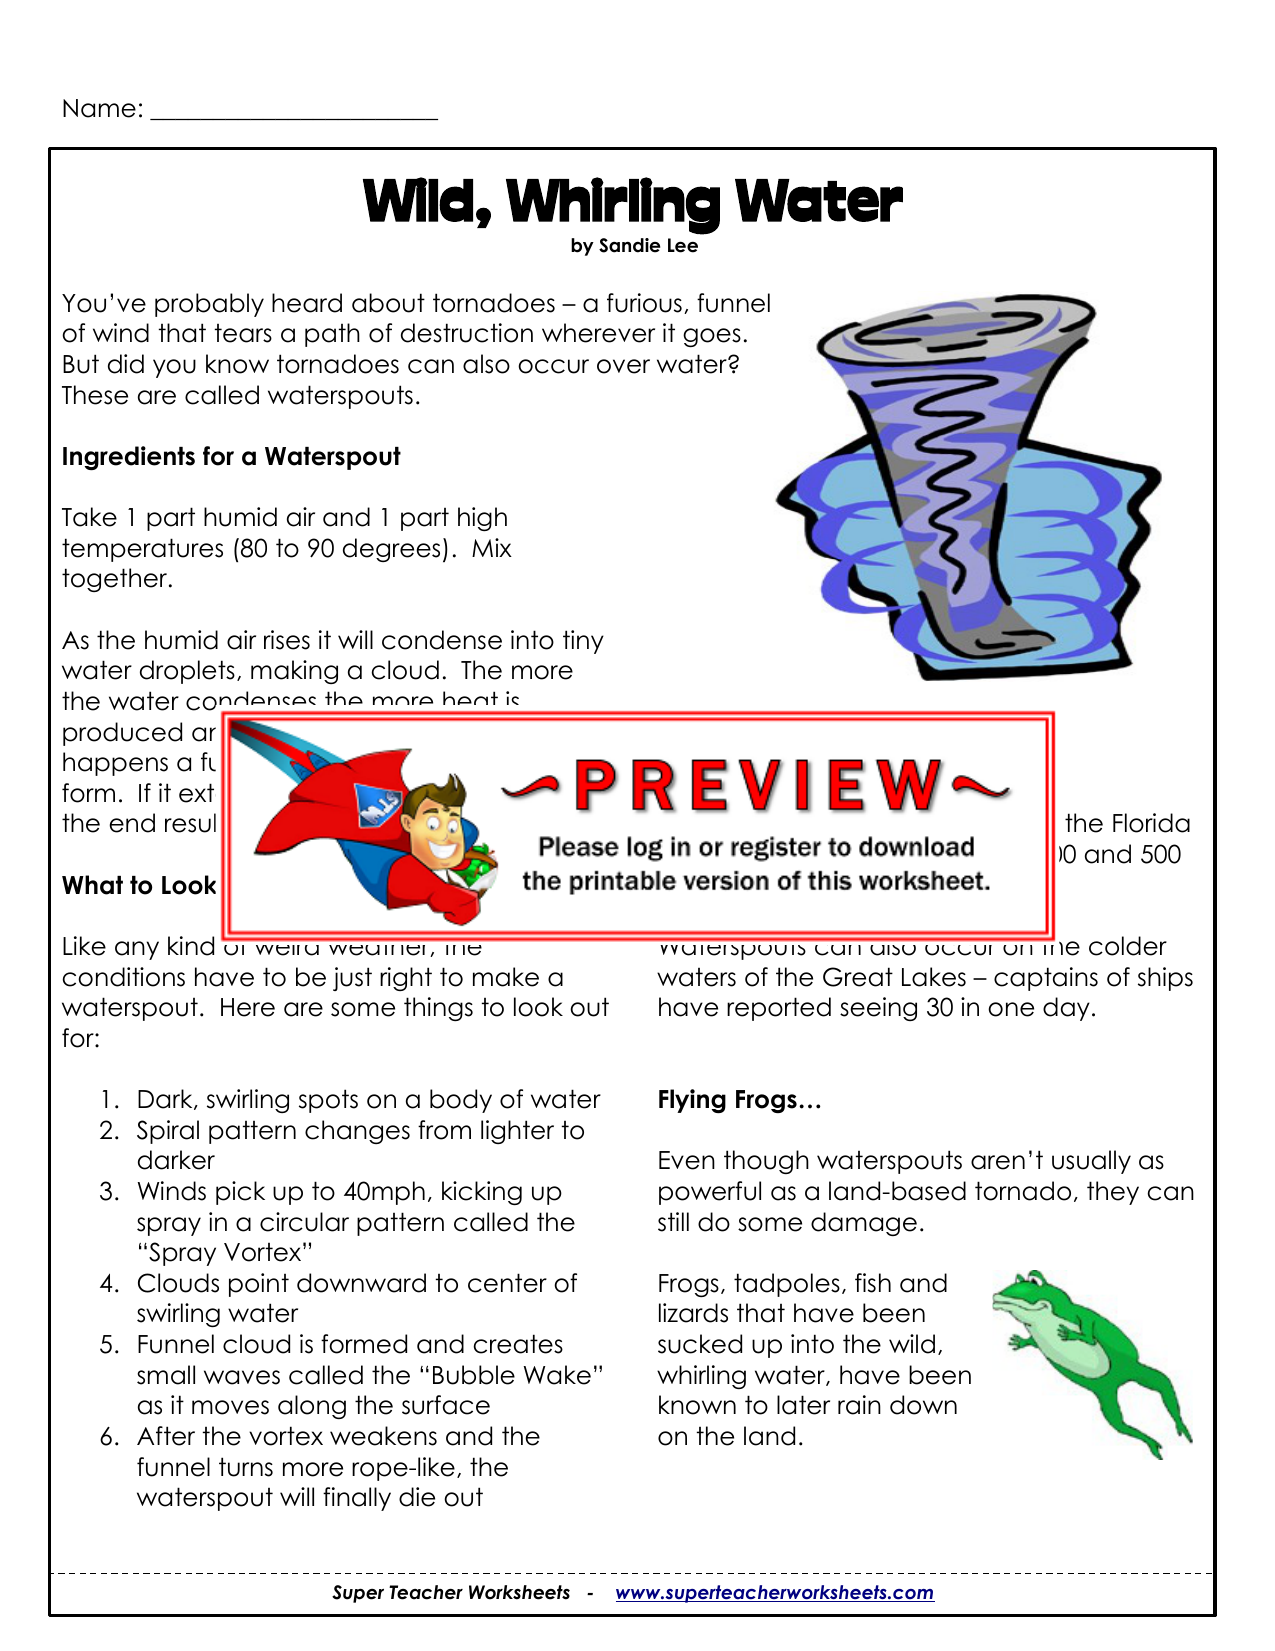 Wild Whirling Water Super Teacher Worksheets